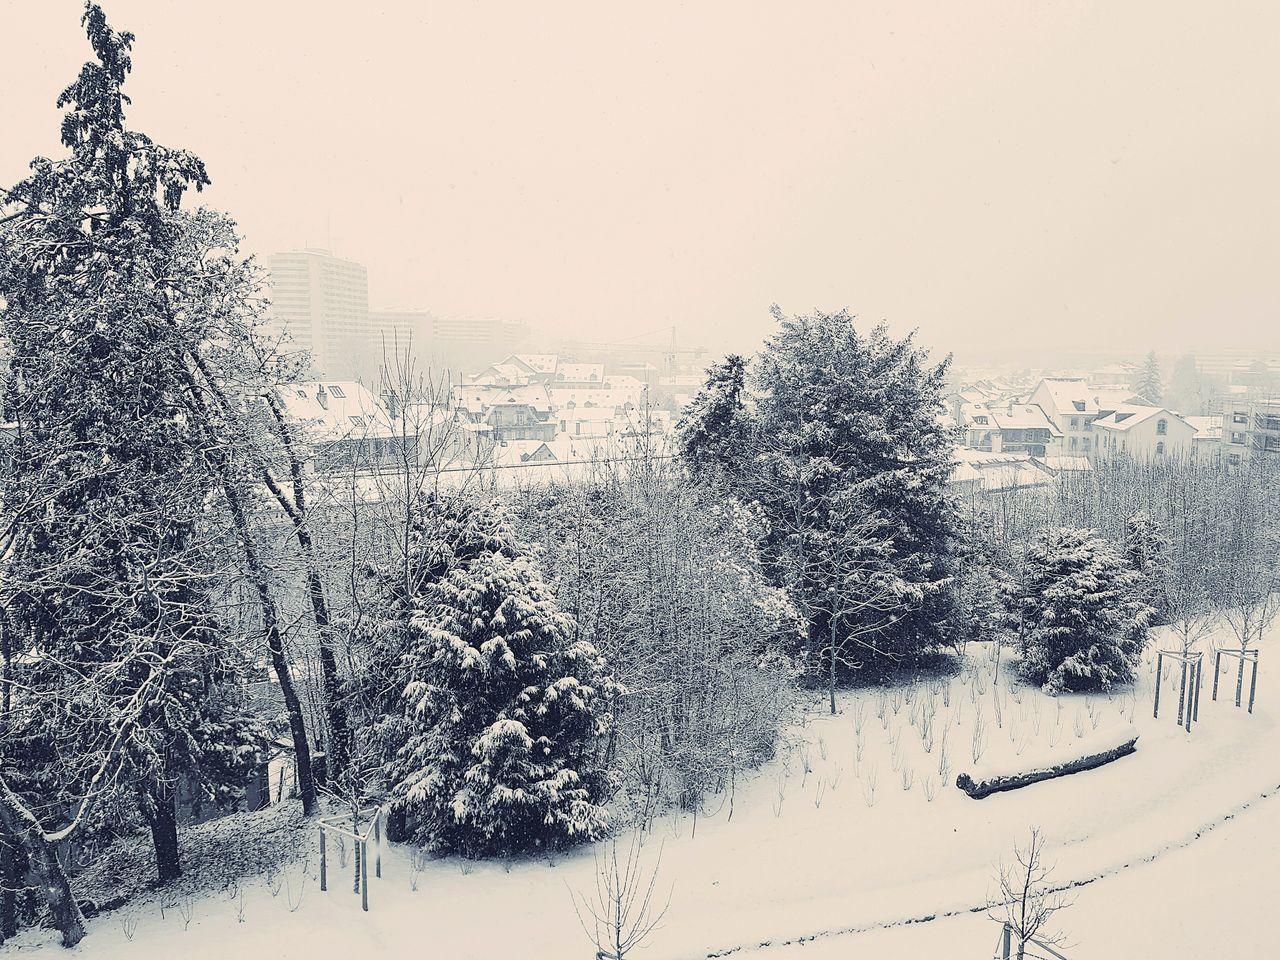 Geneva Geneve Switzerland Genevacity Snow Snow ❄ Snowing Snow Day Geneva Snow EyeEmNewHere EyeEm Best Shots EyeEm Nature Lover